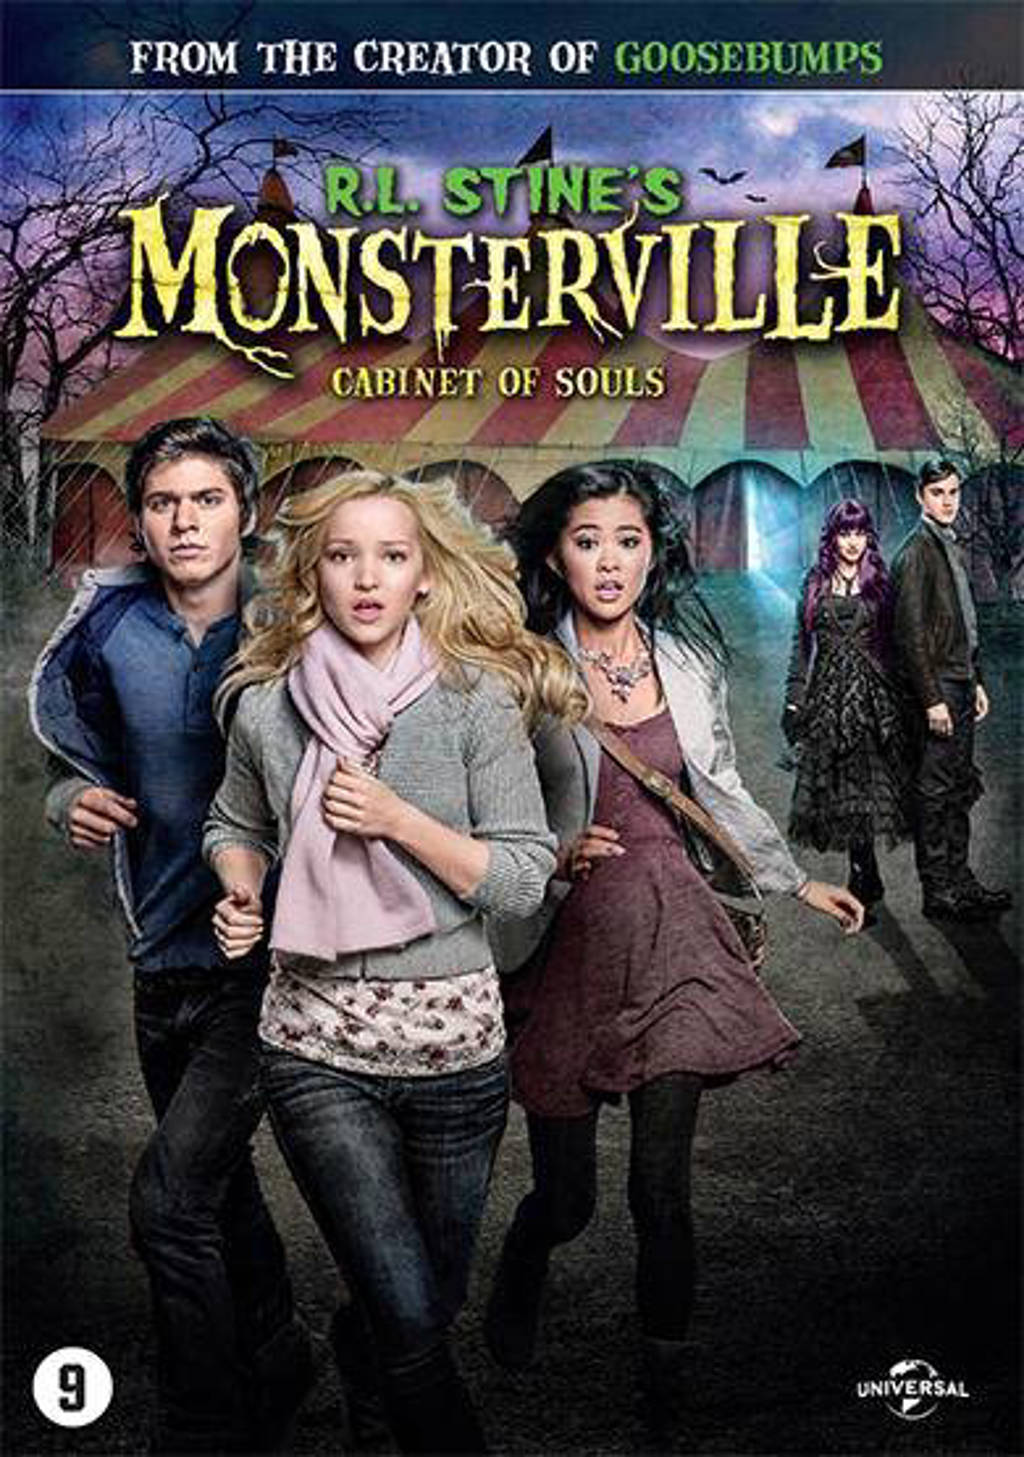 R.L. Stine's monsterville - Cabinet of souls (DVD)